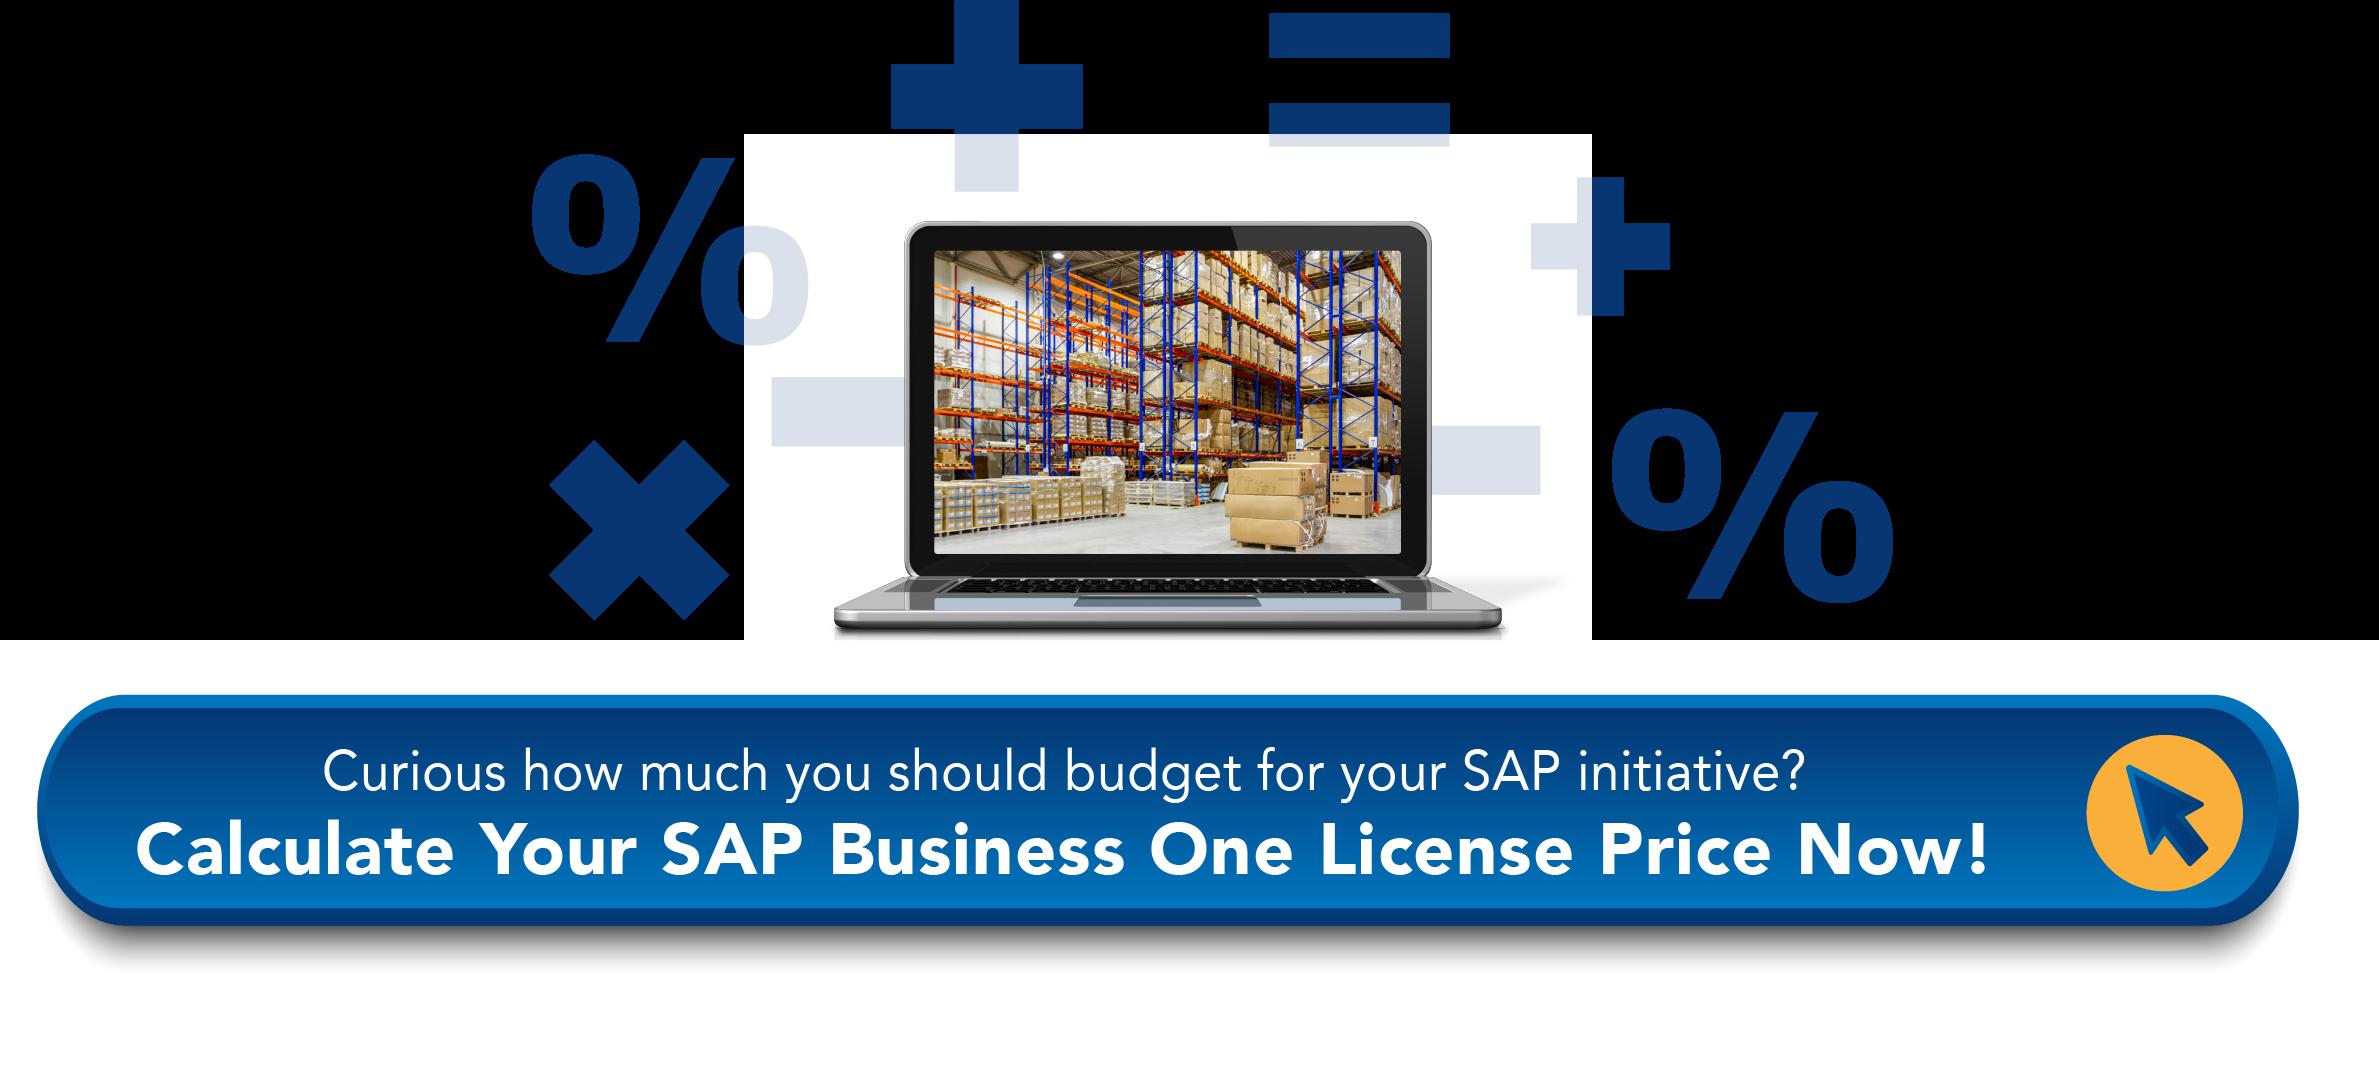 SAP Business One Price